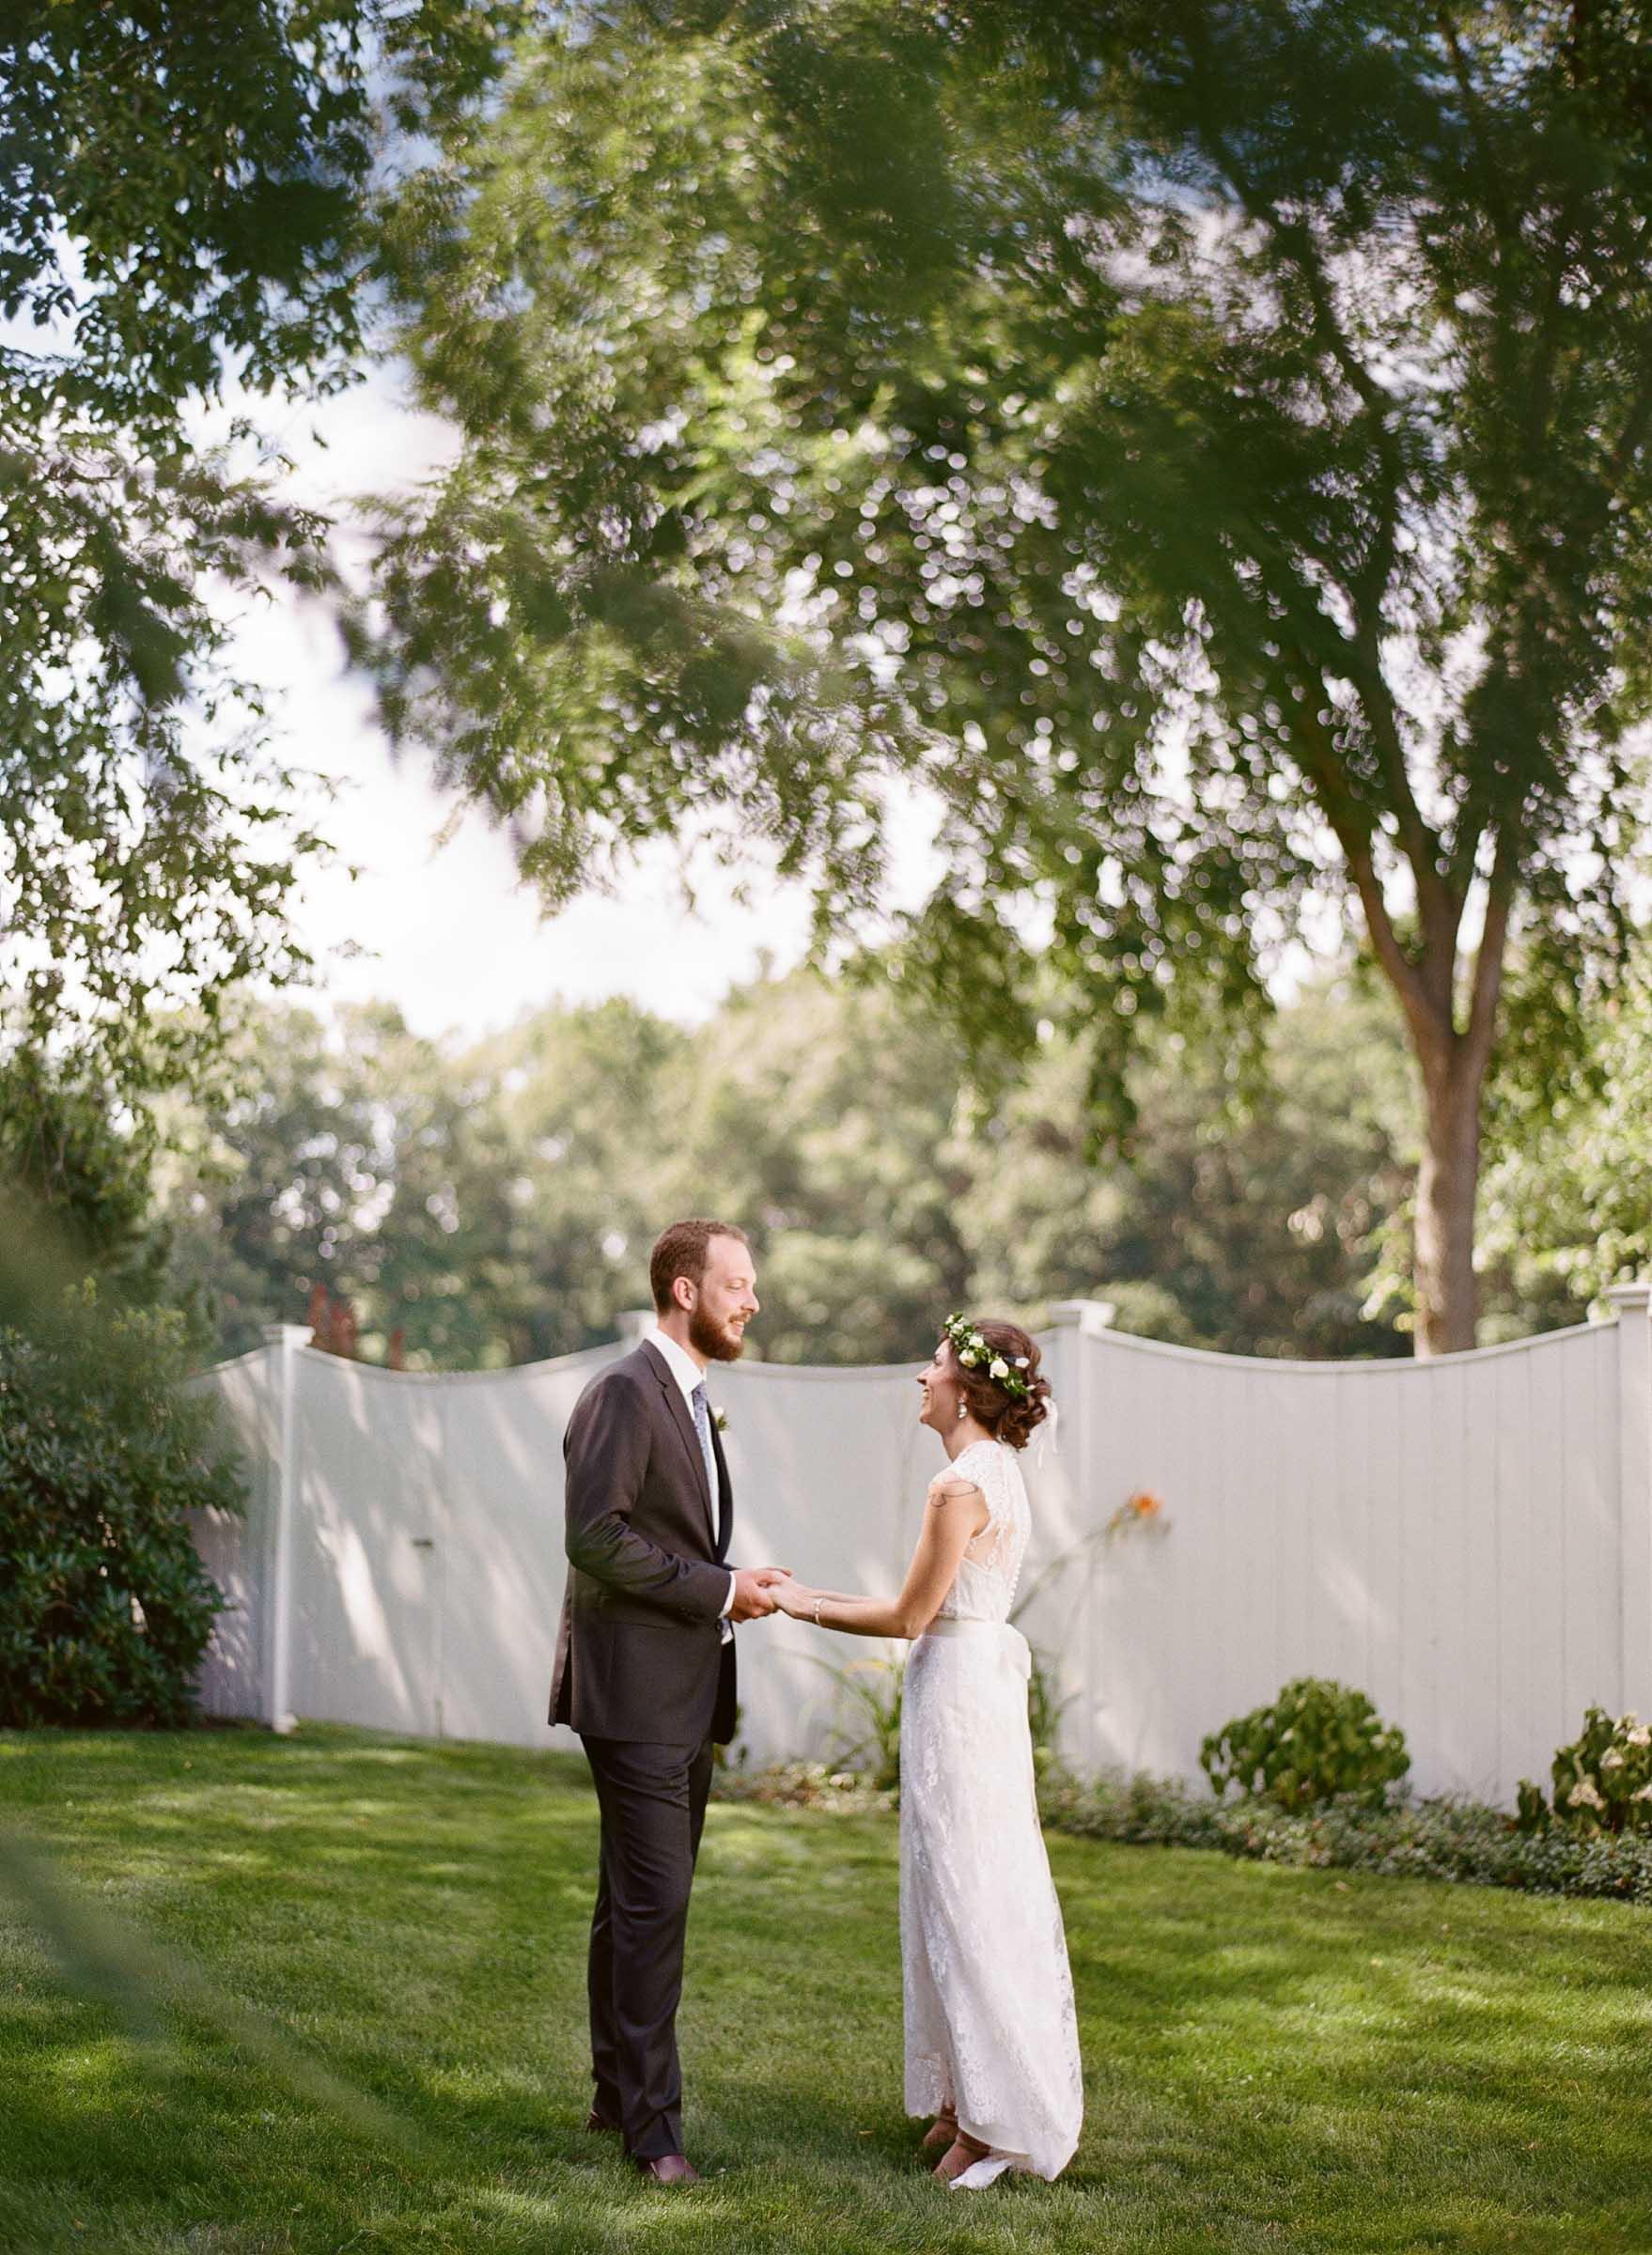 Concord-Wedding-Photography-44.jpg